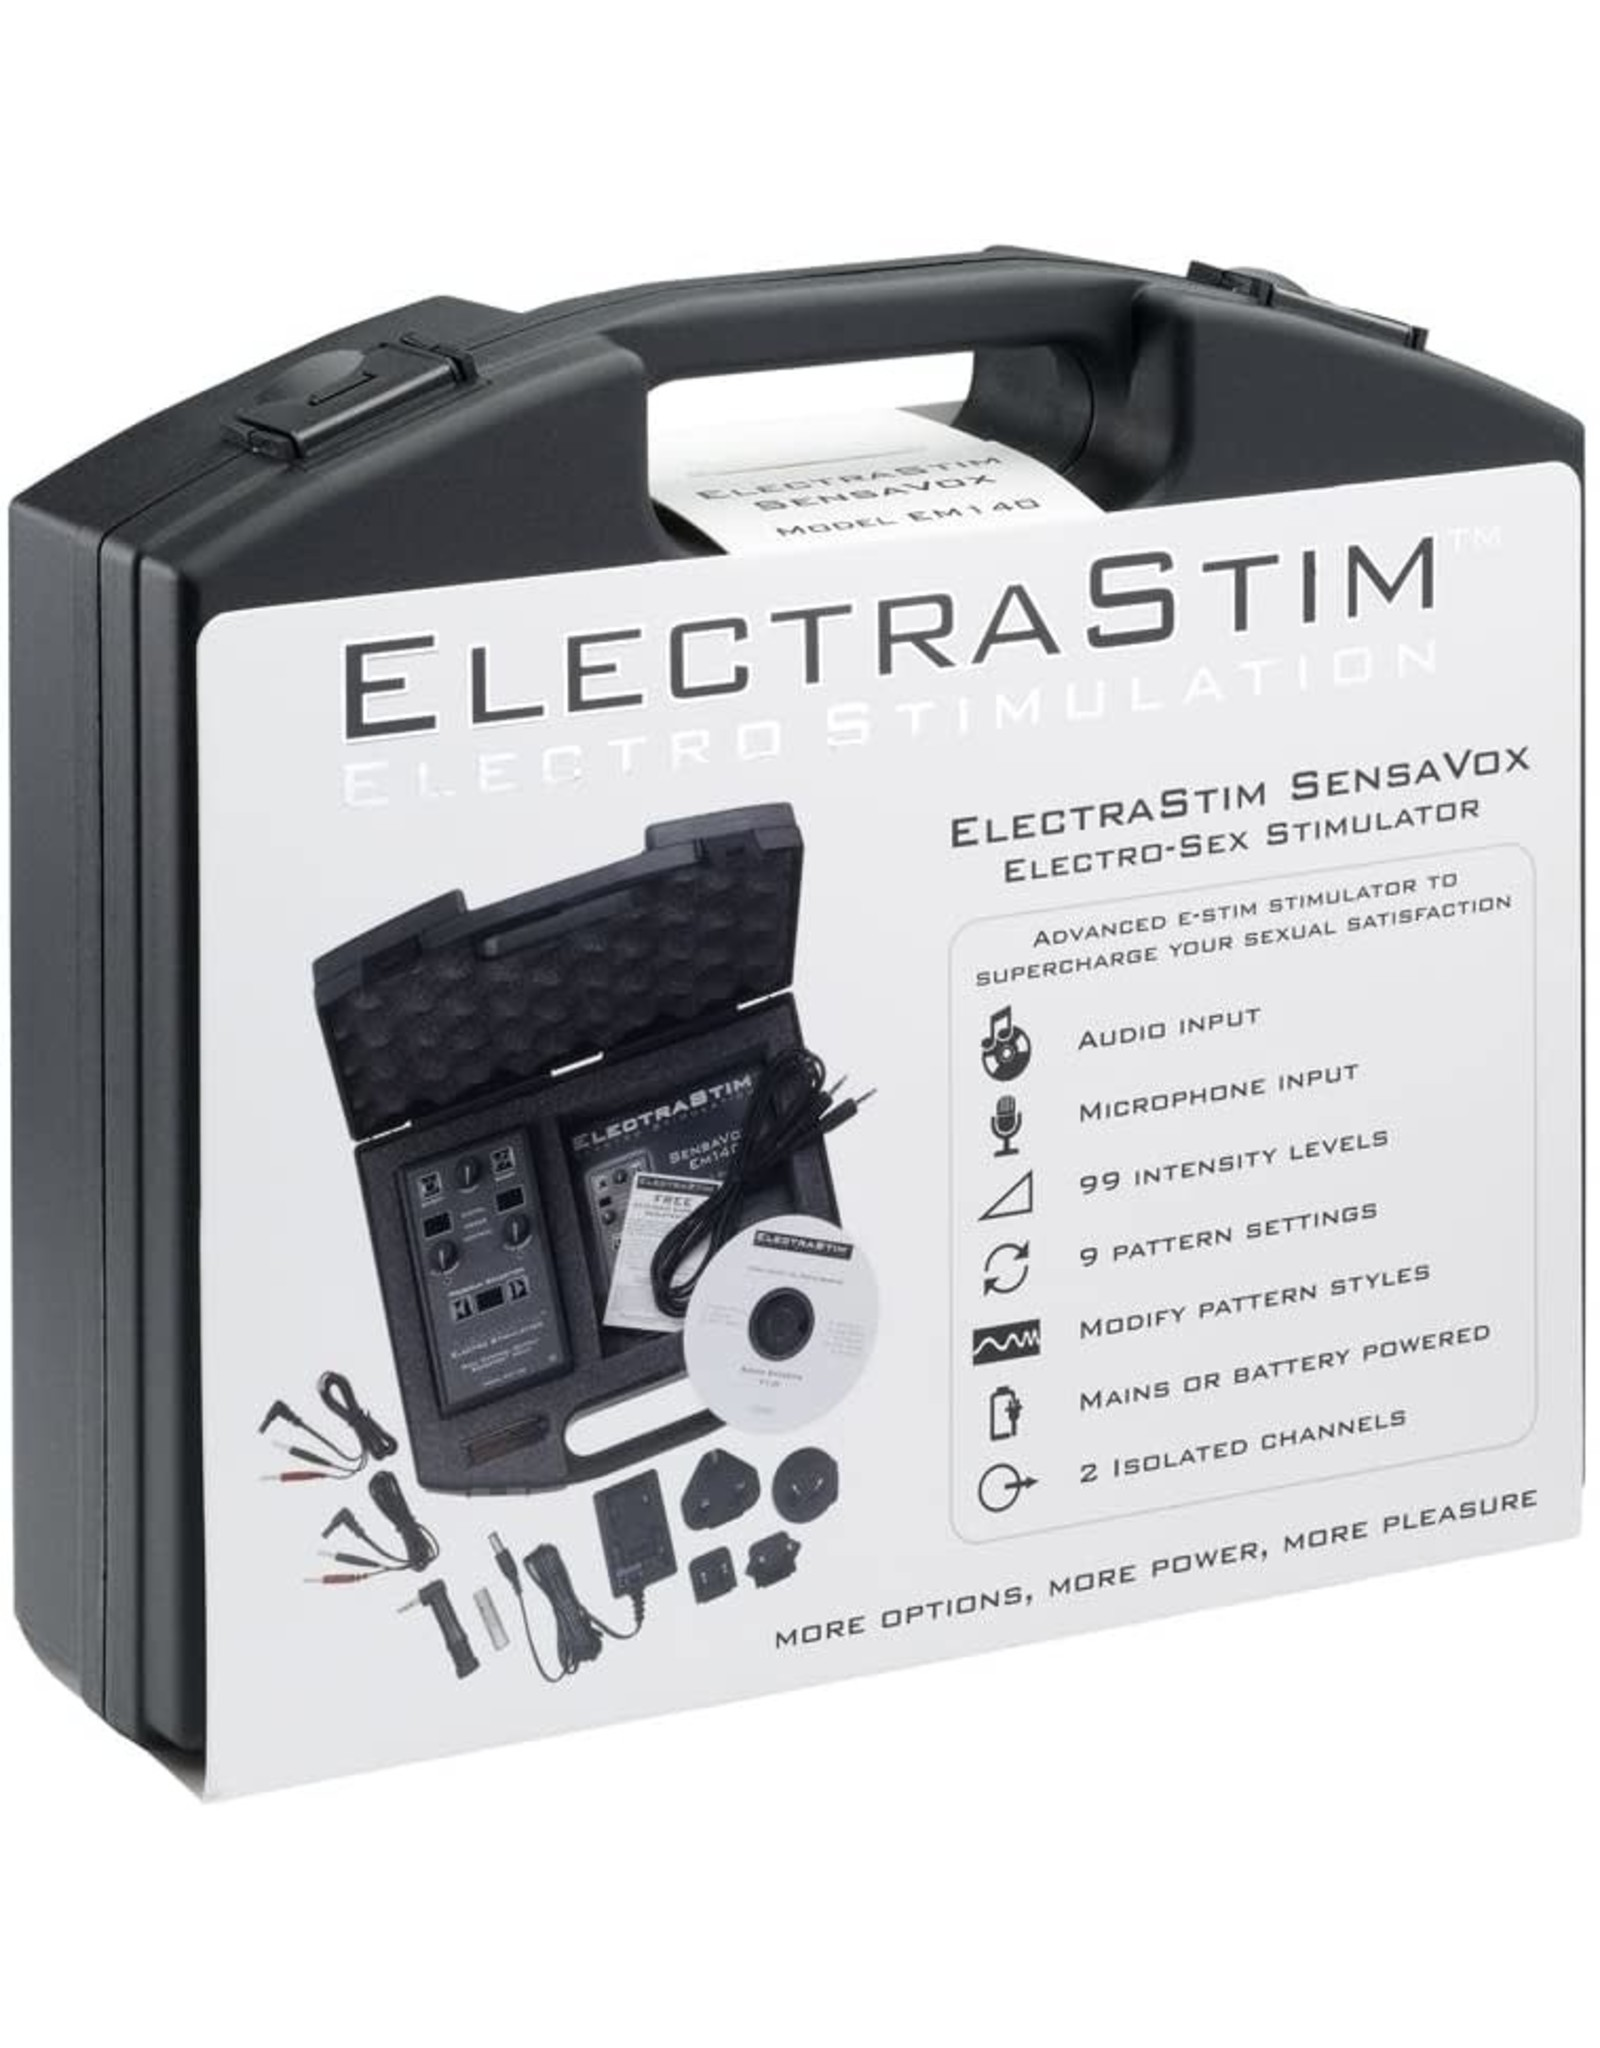 Electrastim ElectroStim Sensavox